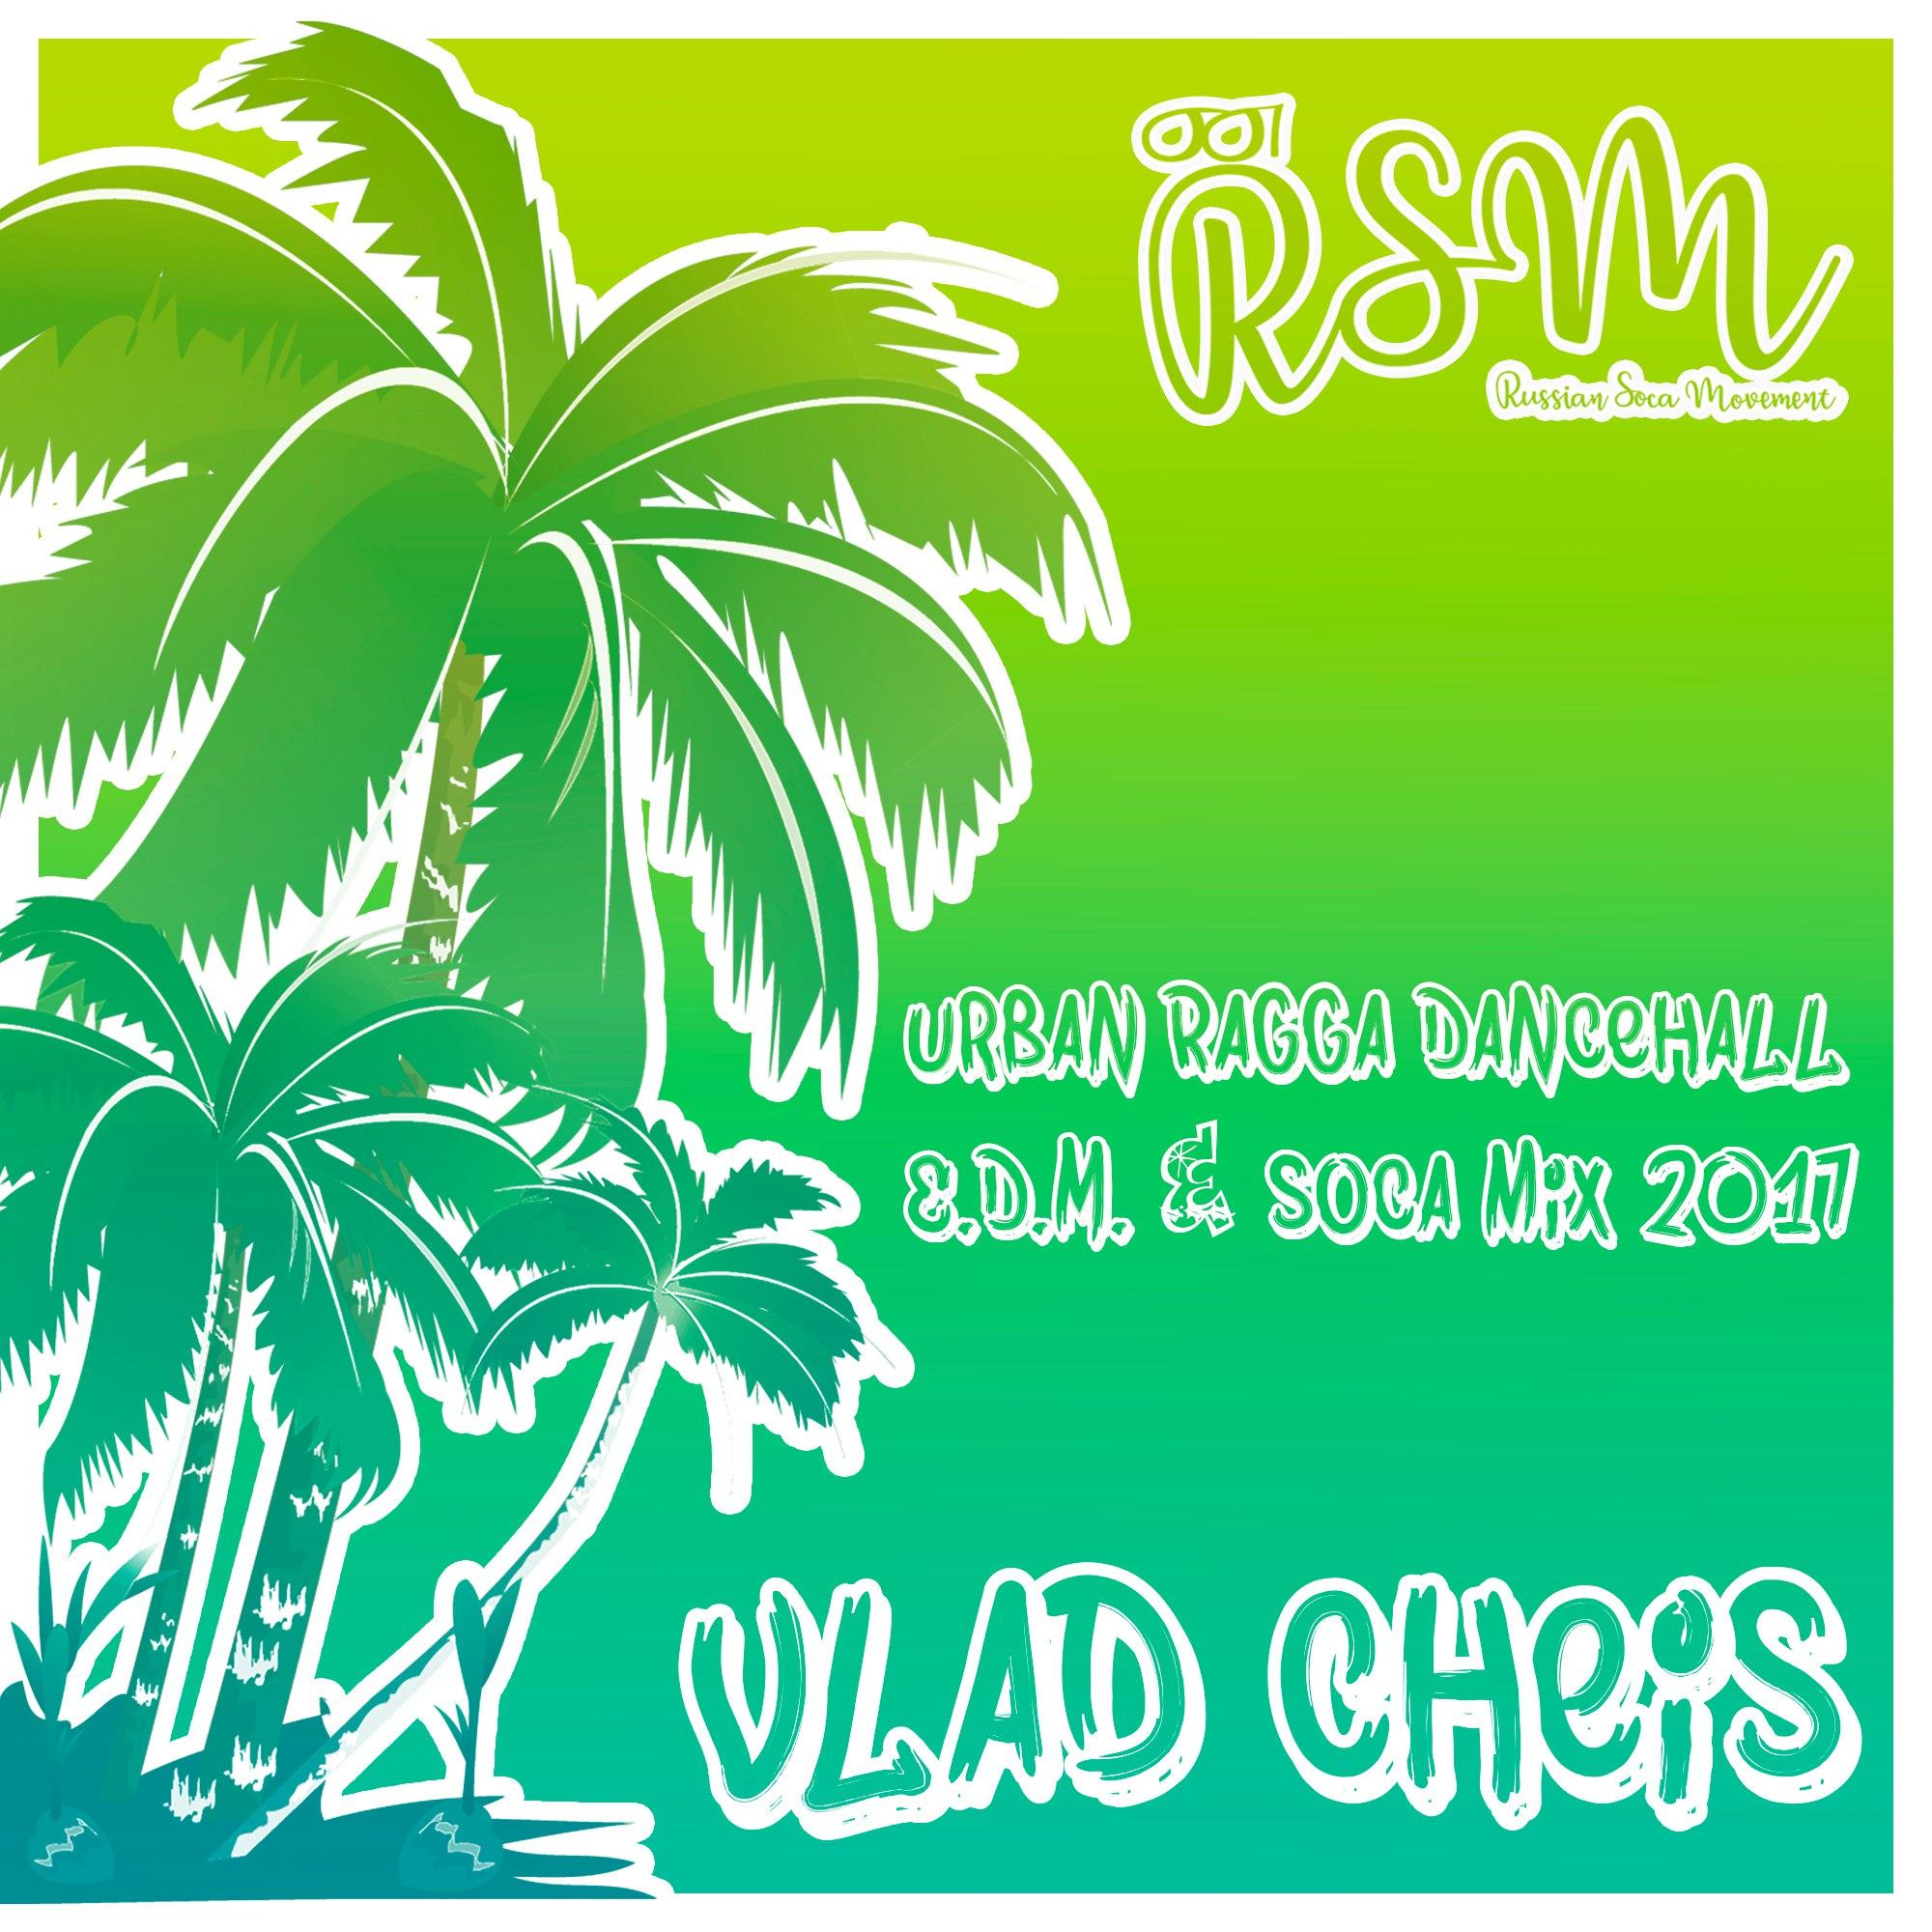 Vlad Cheis – Urban Ragga Dancehall mix 2017